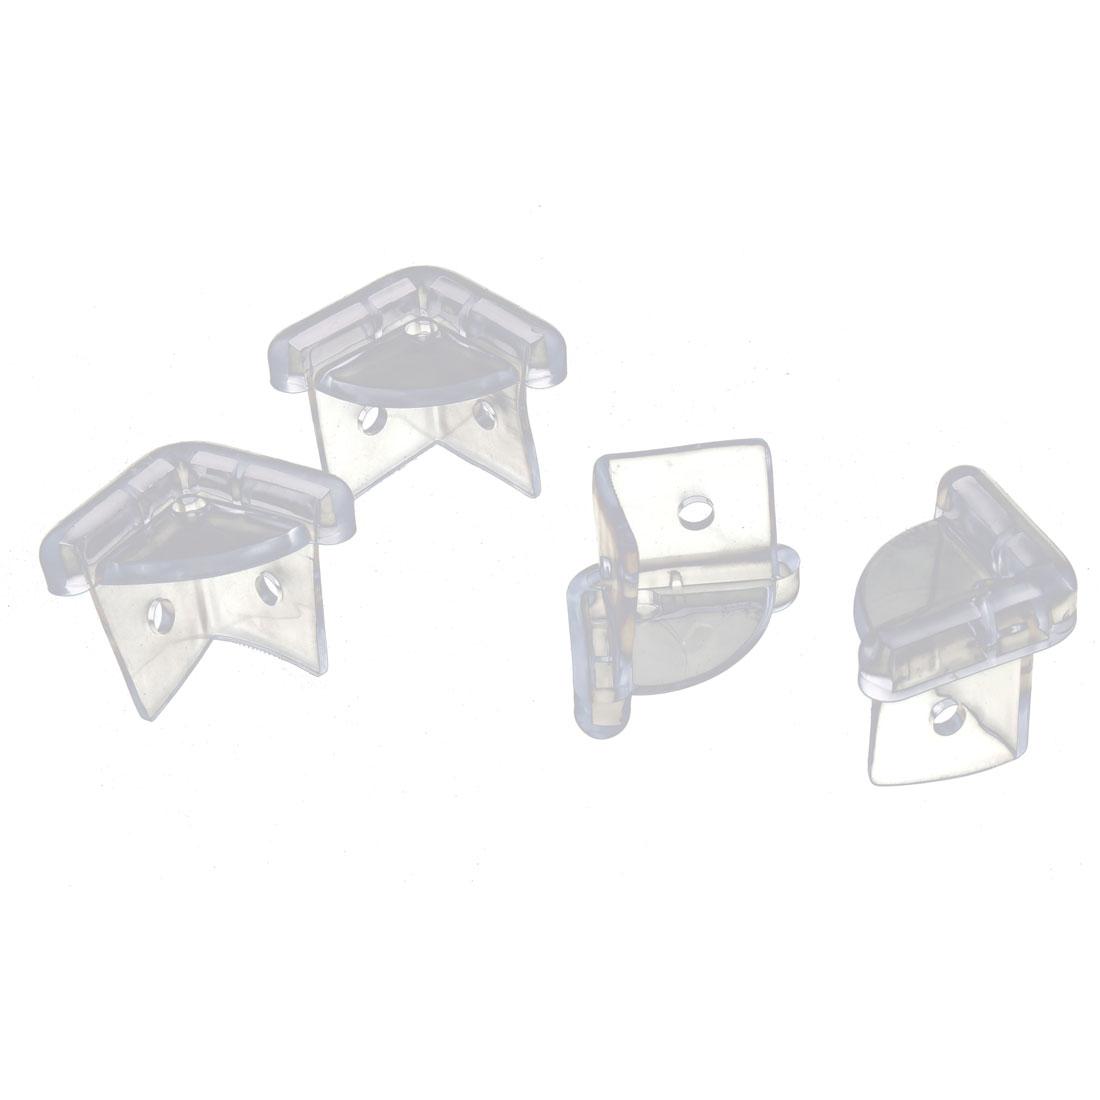 Home Plastic Table Desk Worktop Corner Cover Cap Bumper Cushion 4pcs